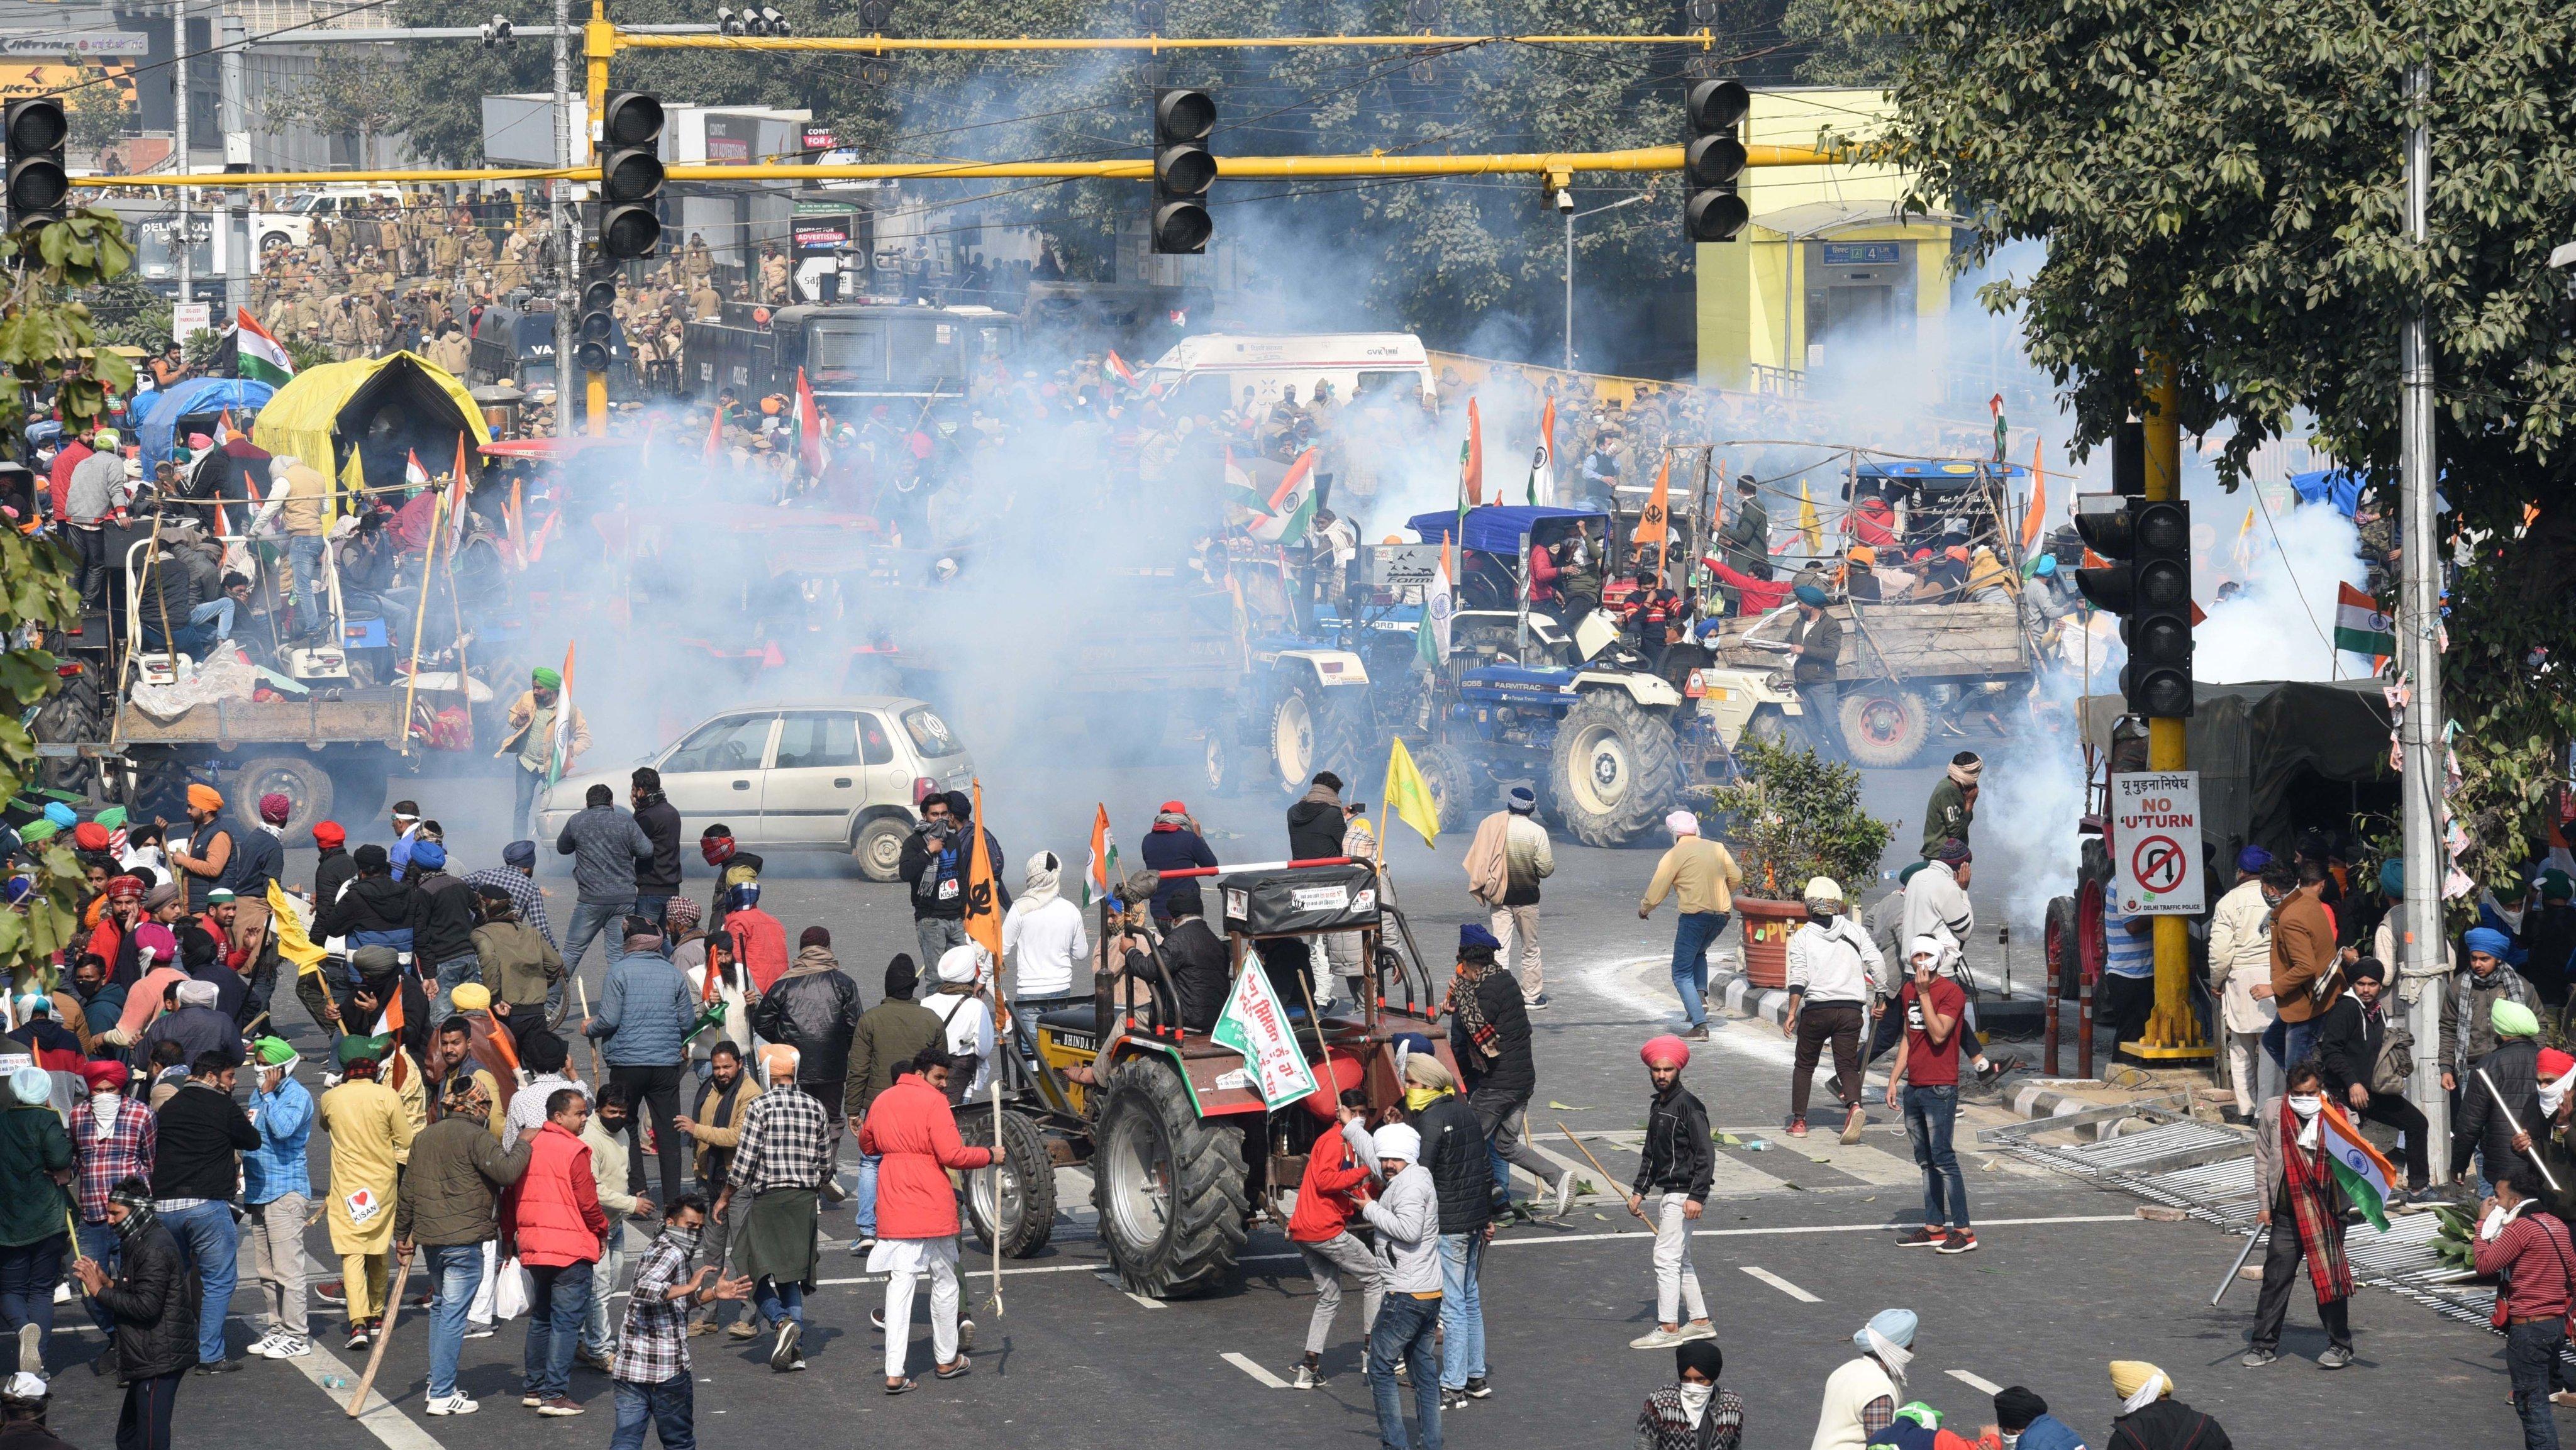 Farmers Tractor Parade In Delhi Against Farm Laws Turns Violent